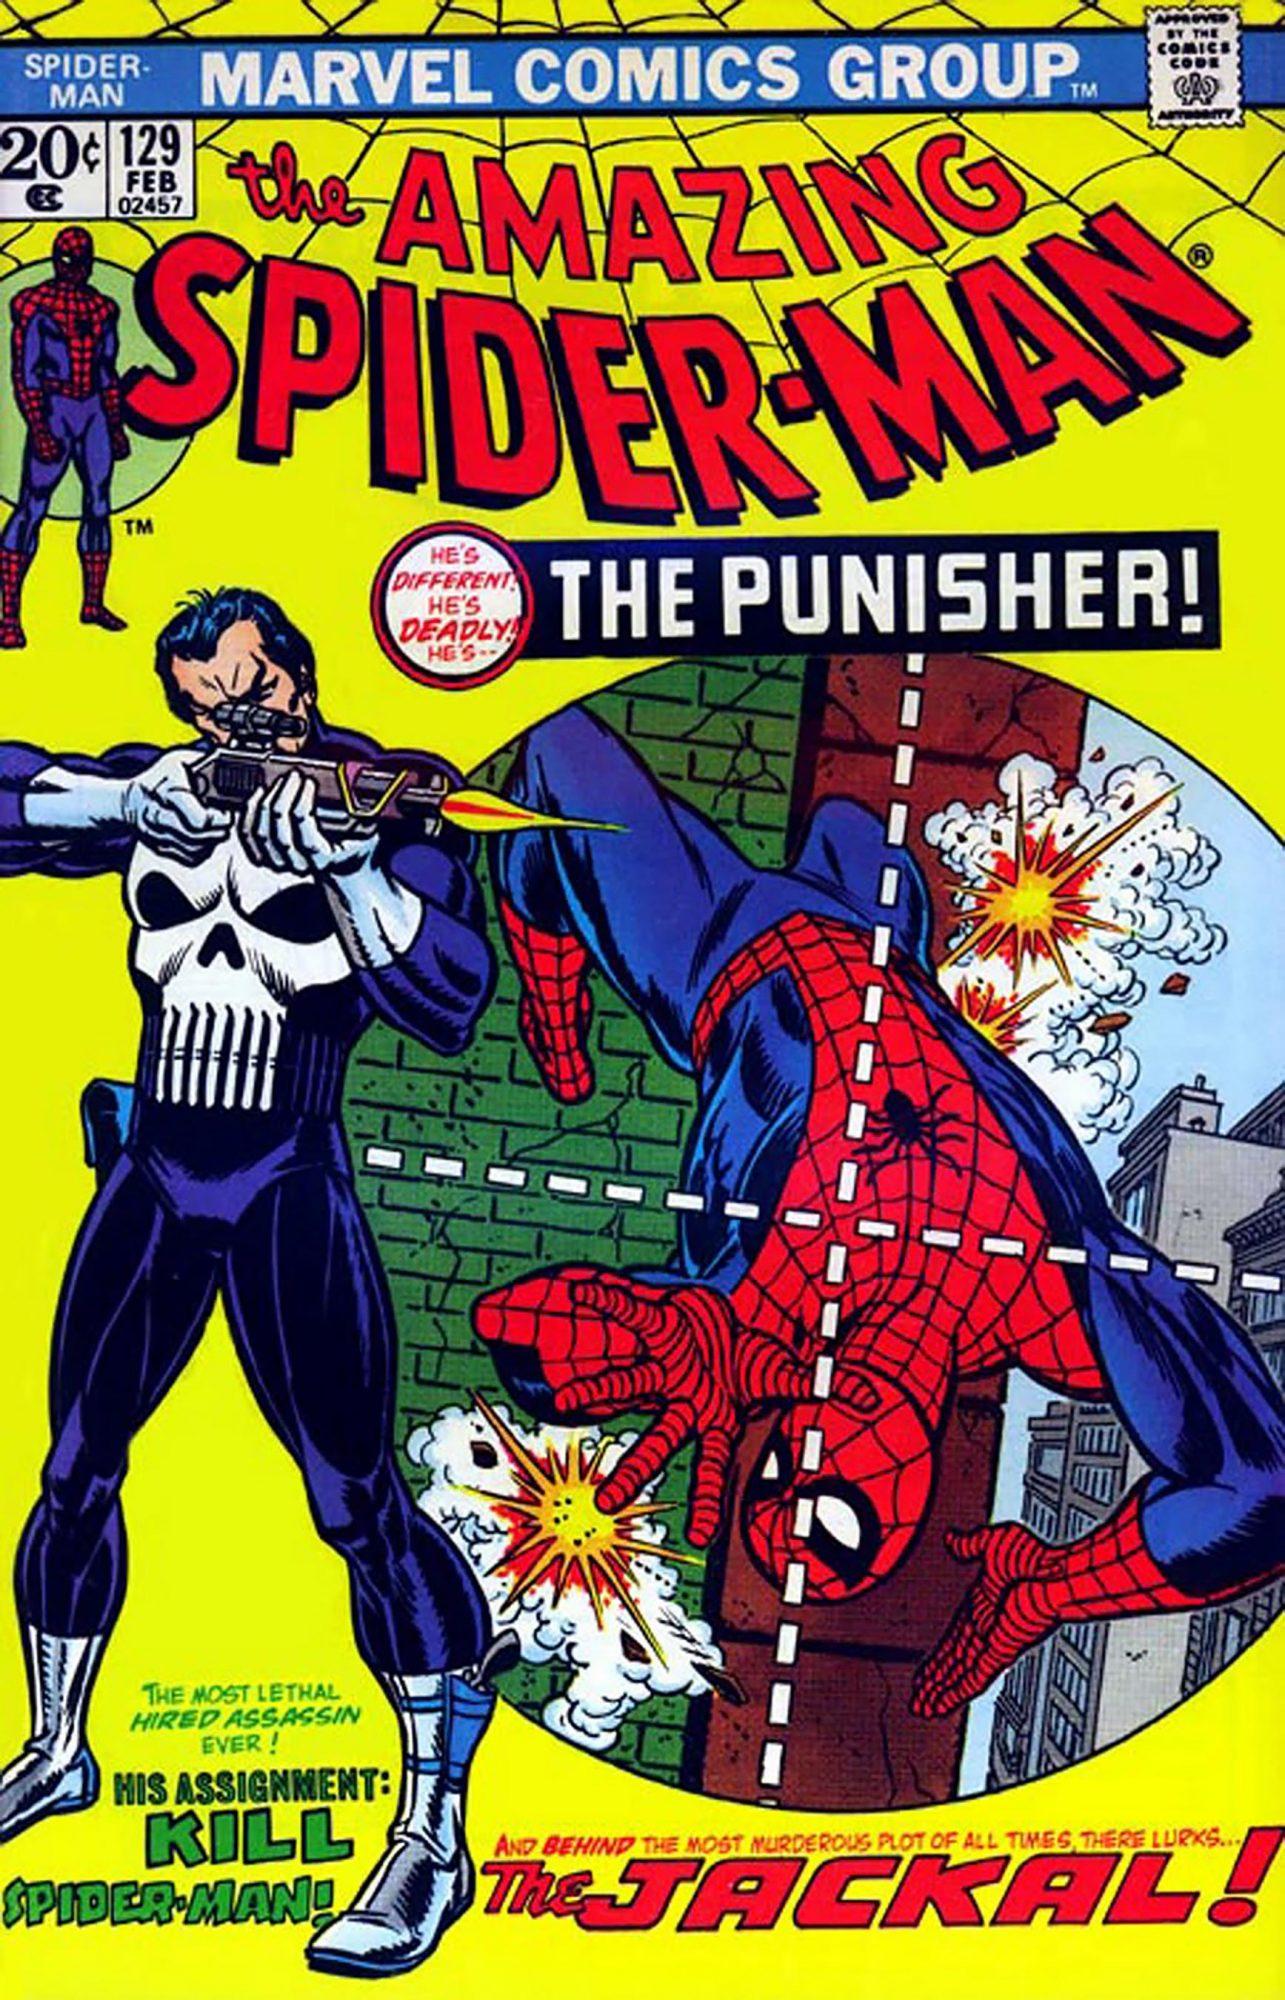 Amazing Spider-Man #129Artist: Gil Kane, 1974